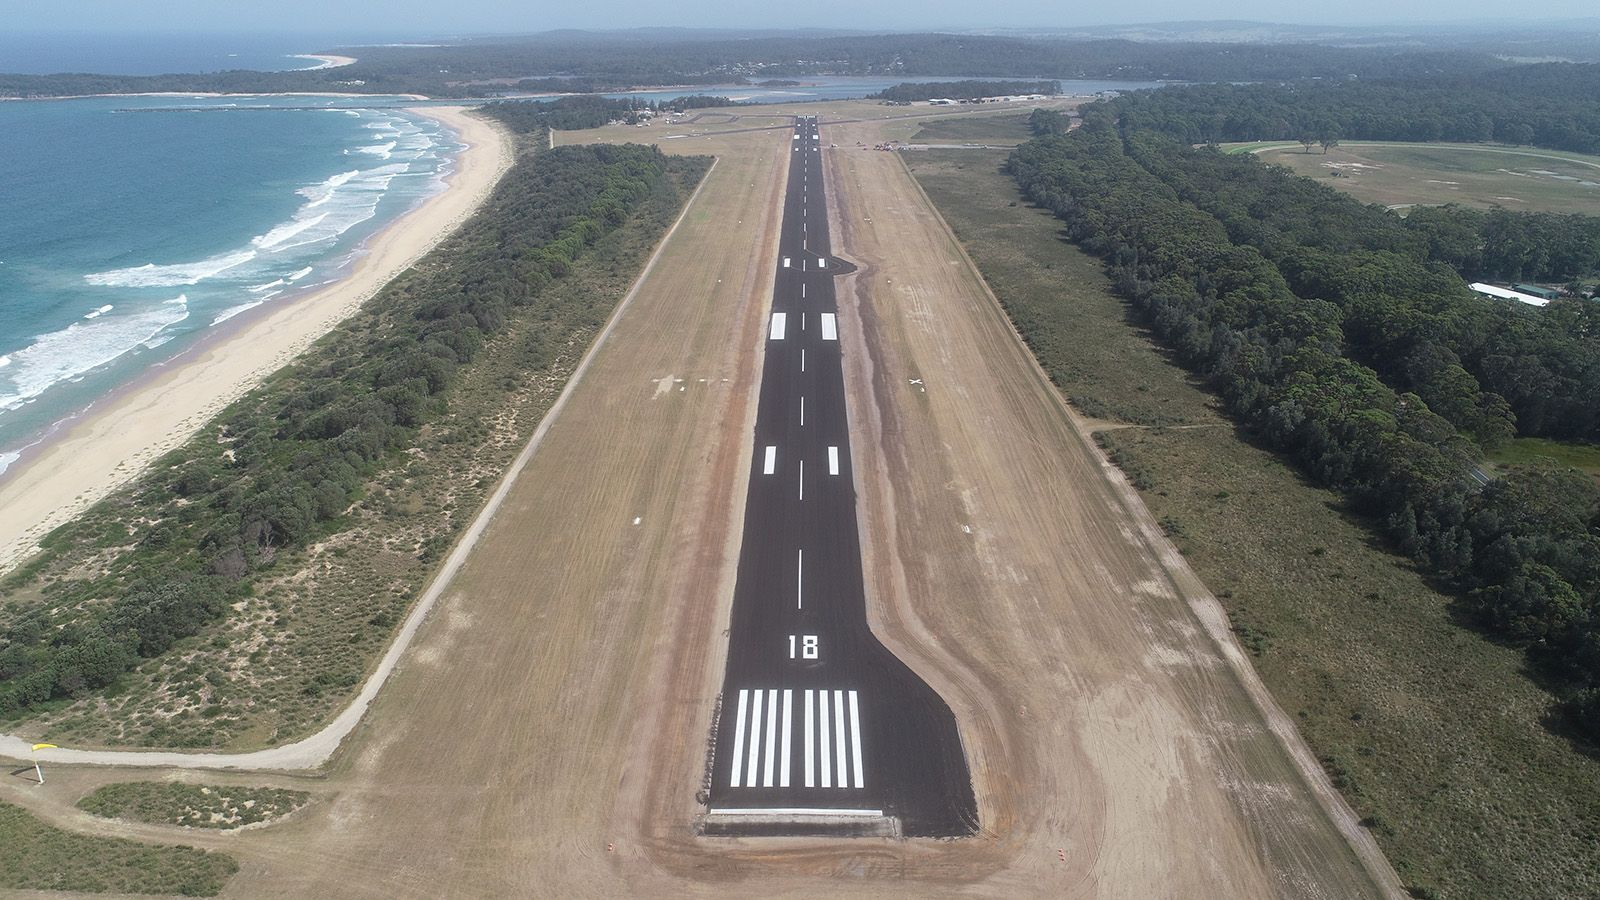 Aerial photograph of Moruya Airport's runway banner image